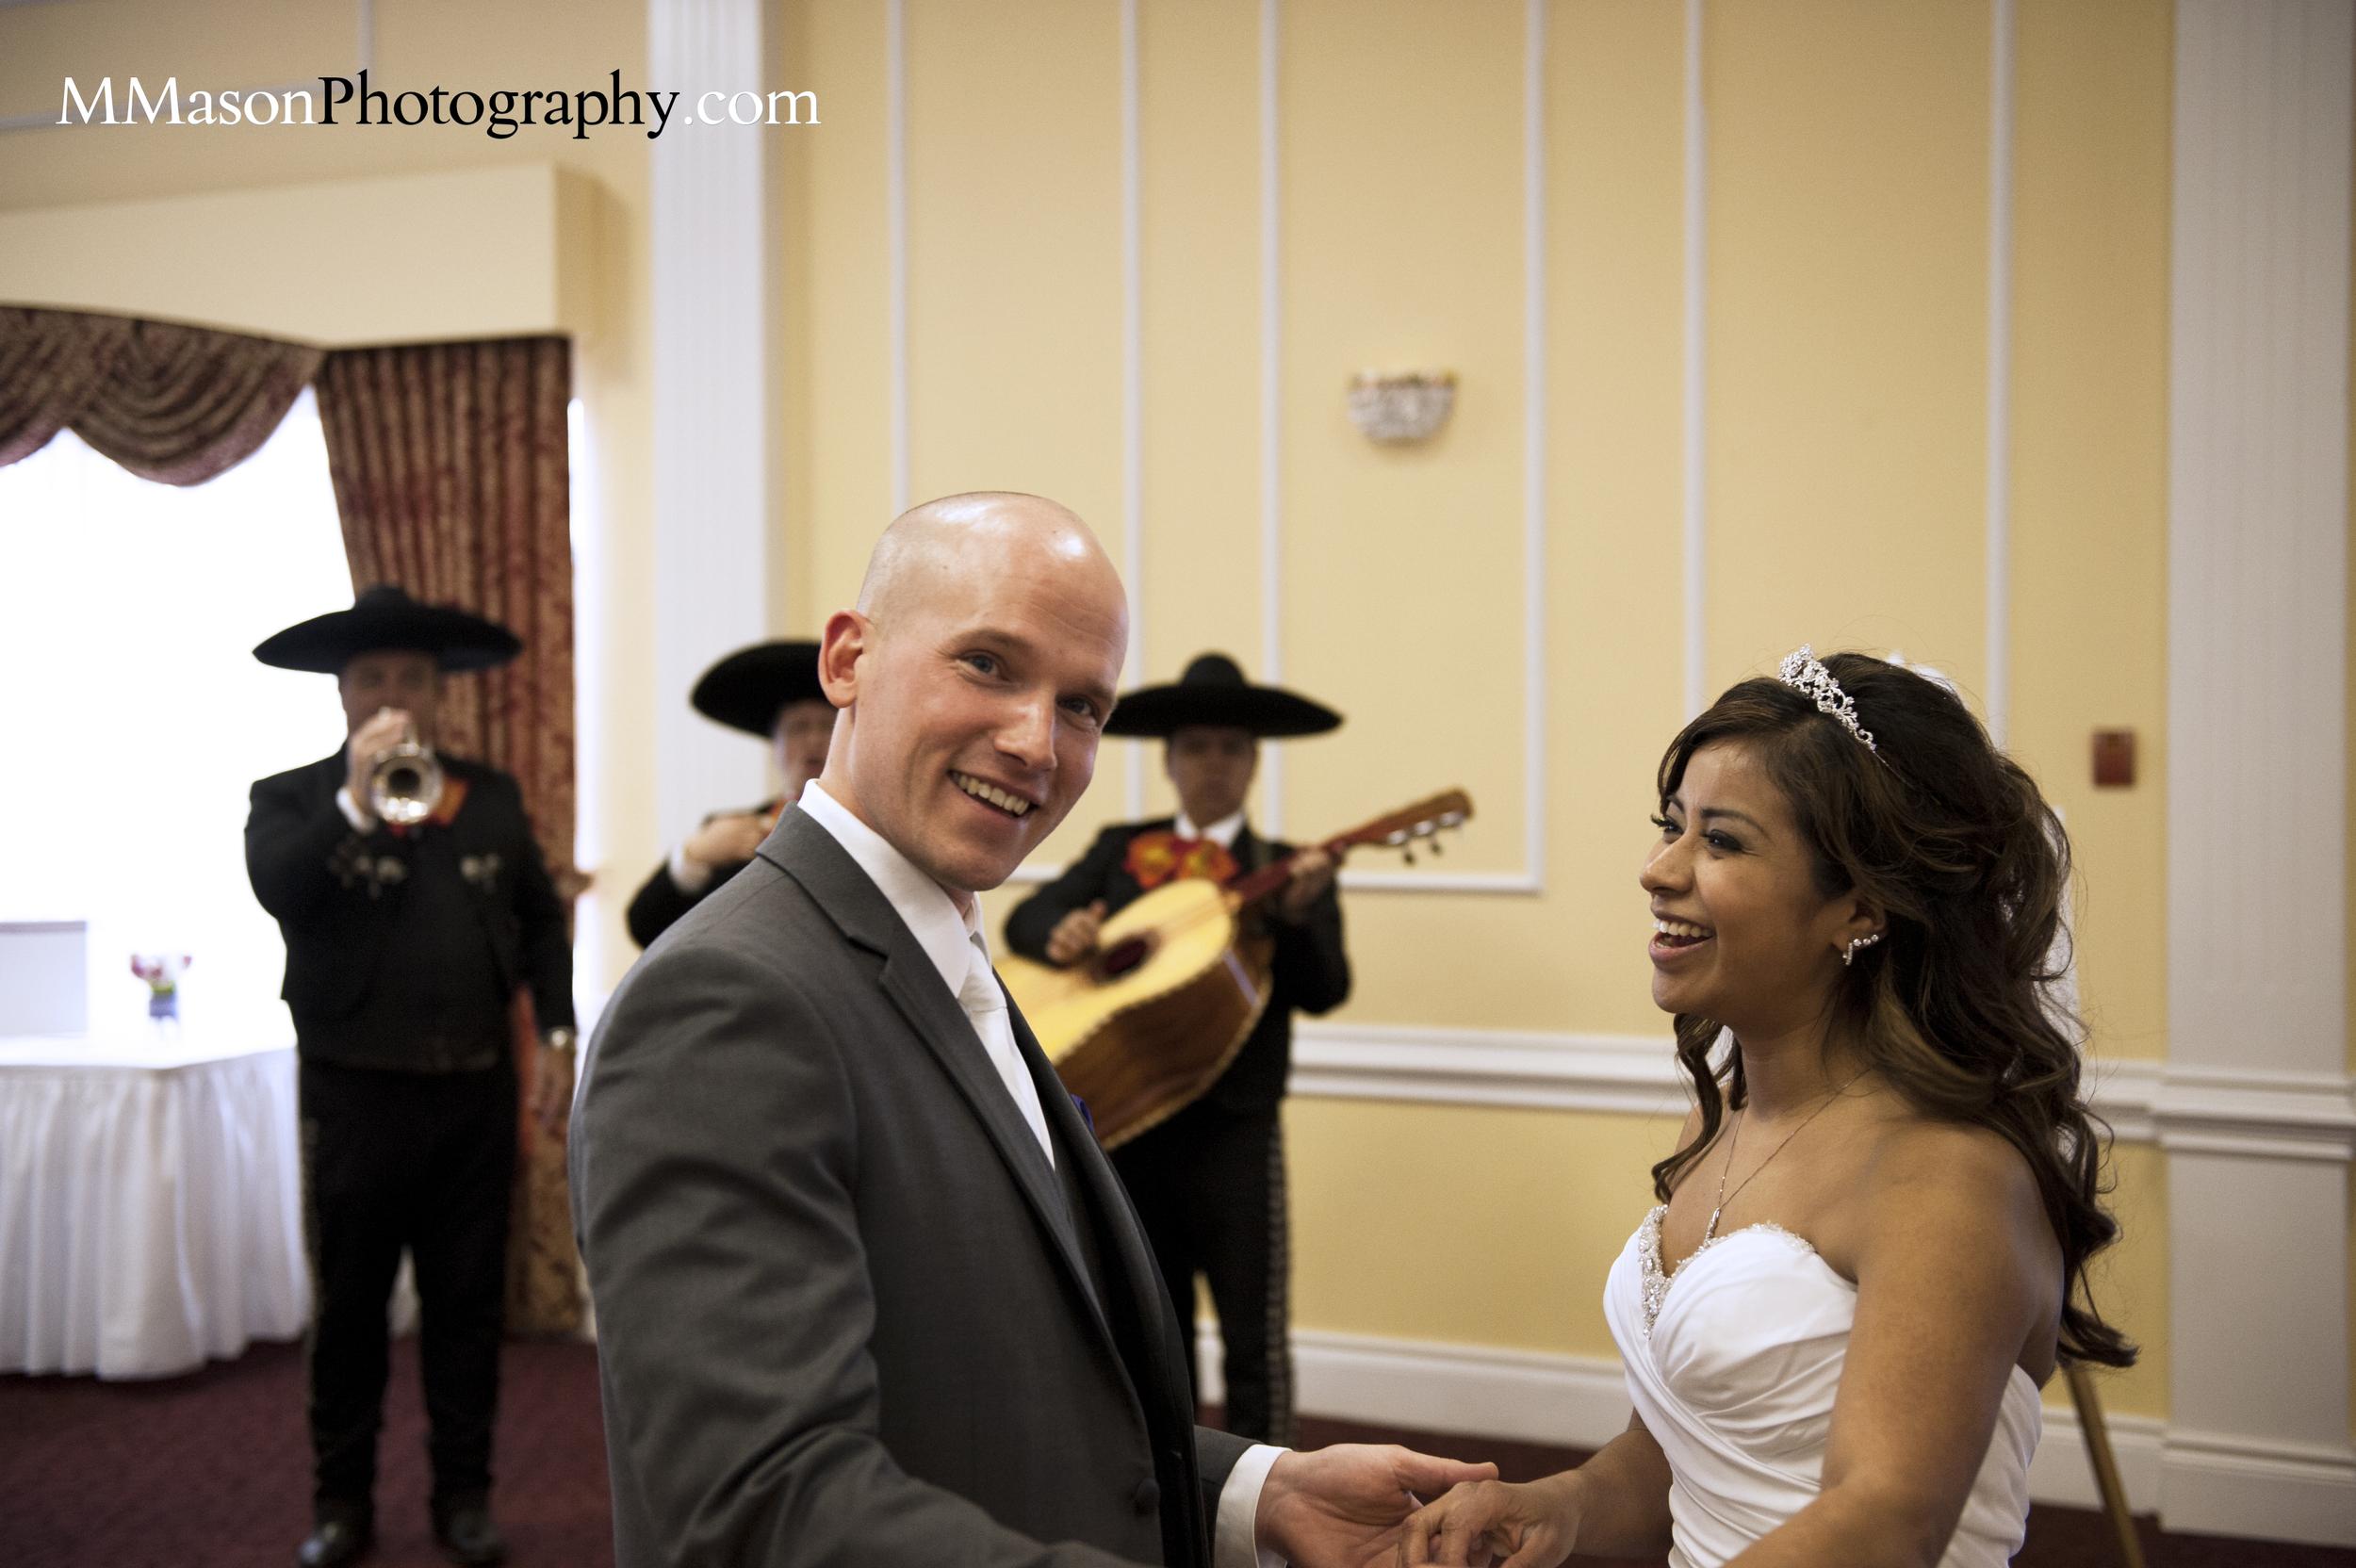 Mike Mason Guelph Wedding Photography